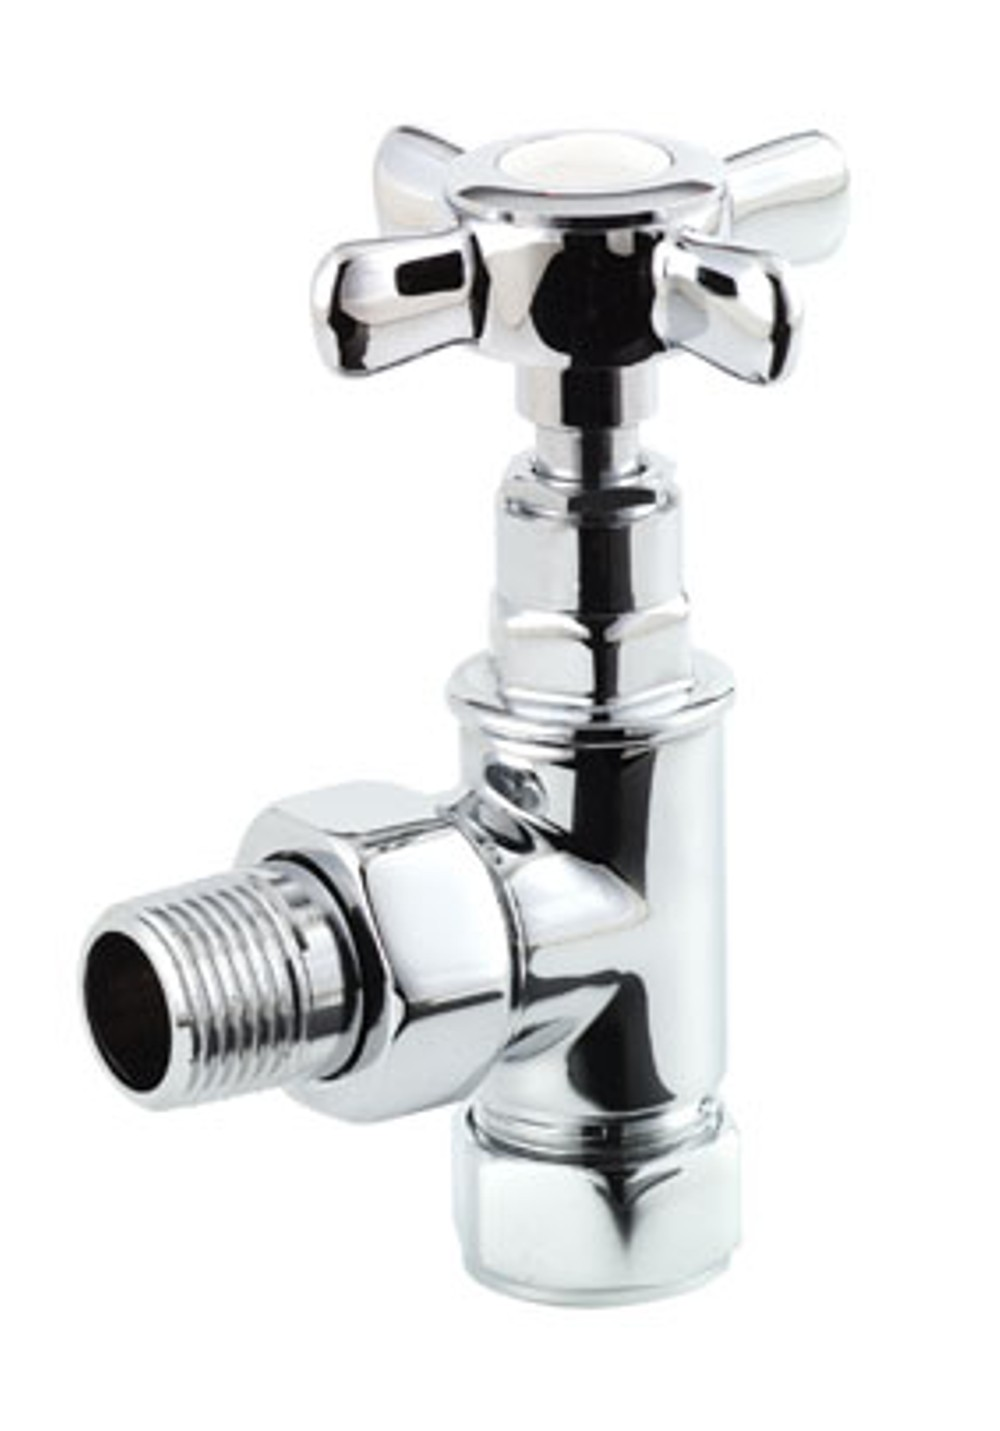 pr-selene-angle-rad-valve-cp-01801.jpg